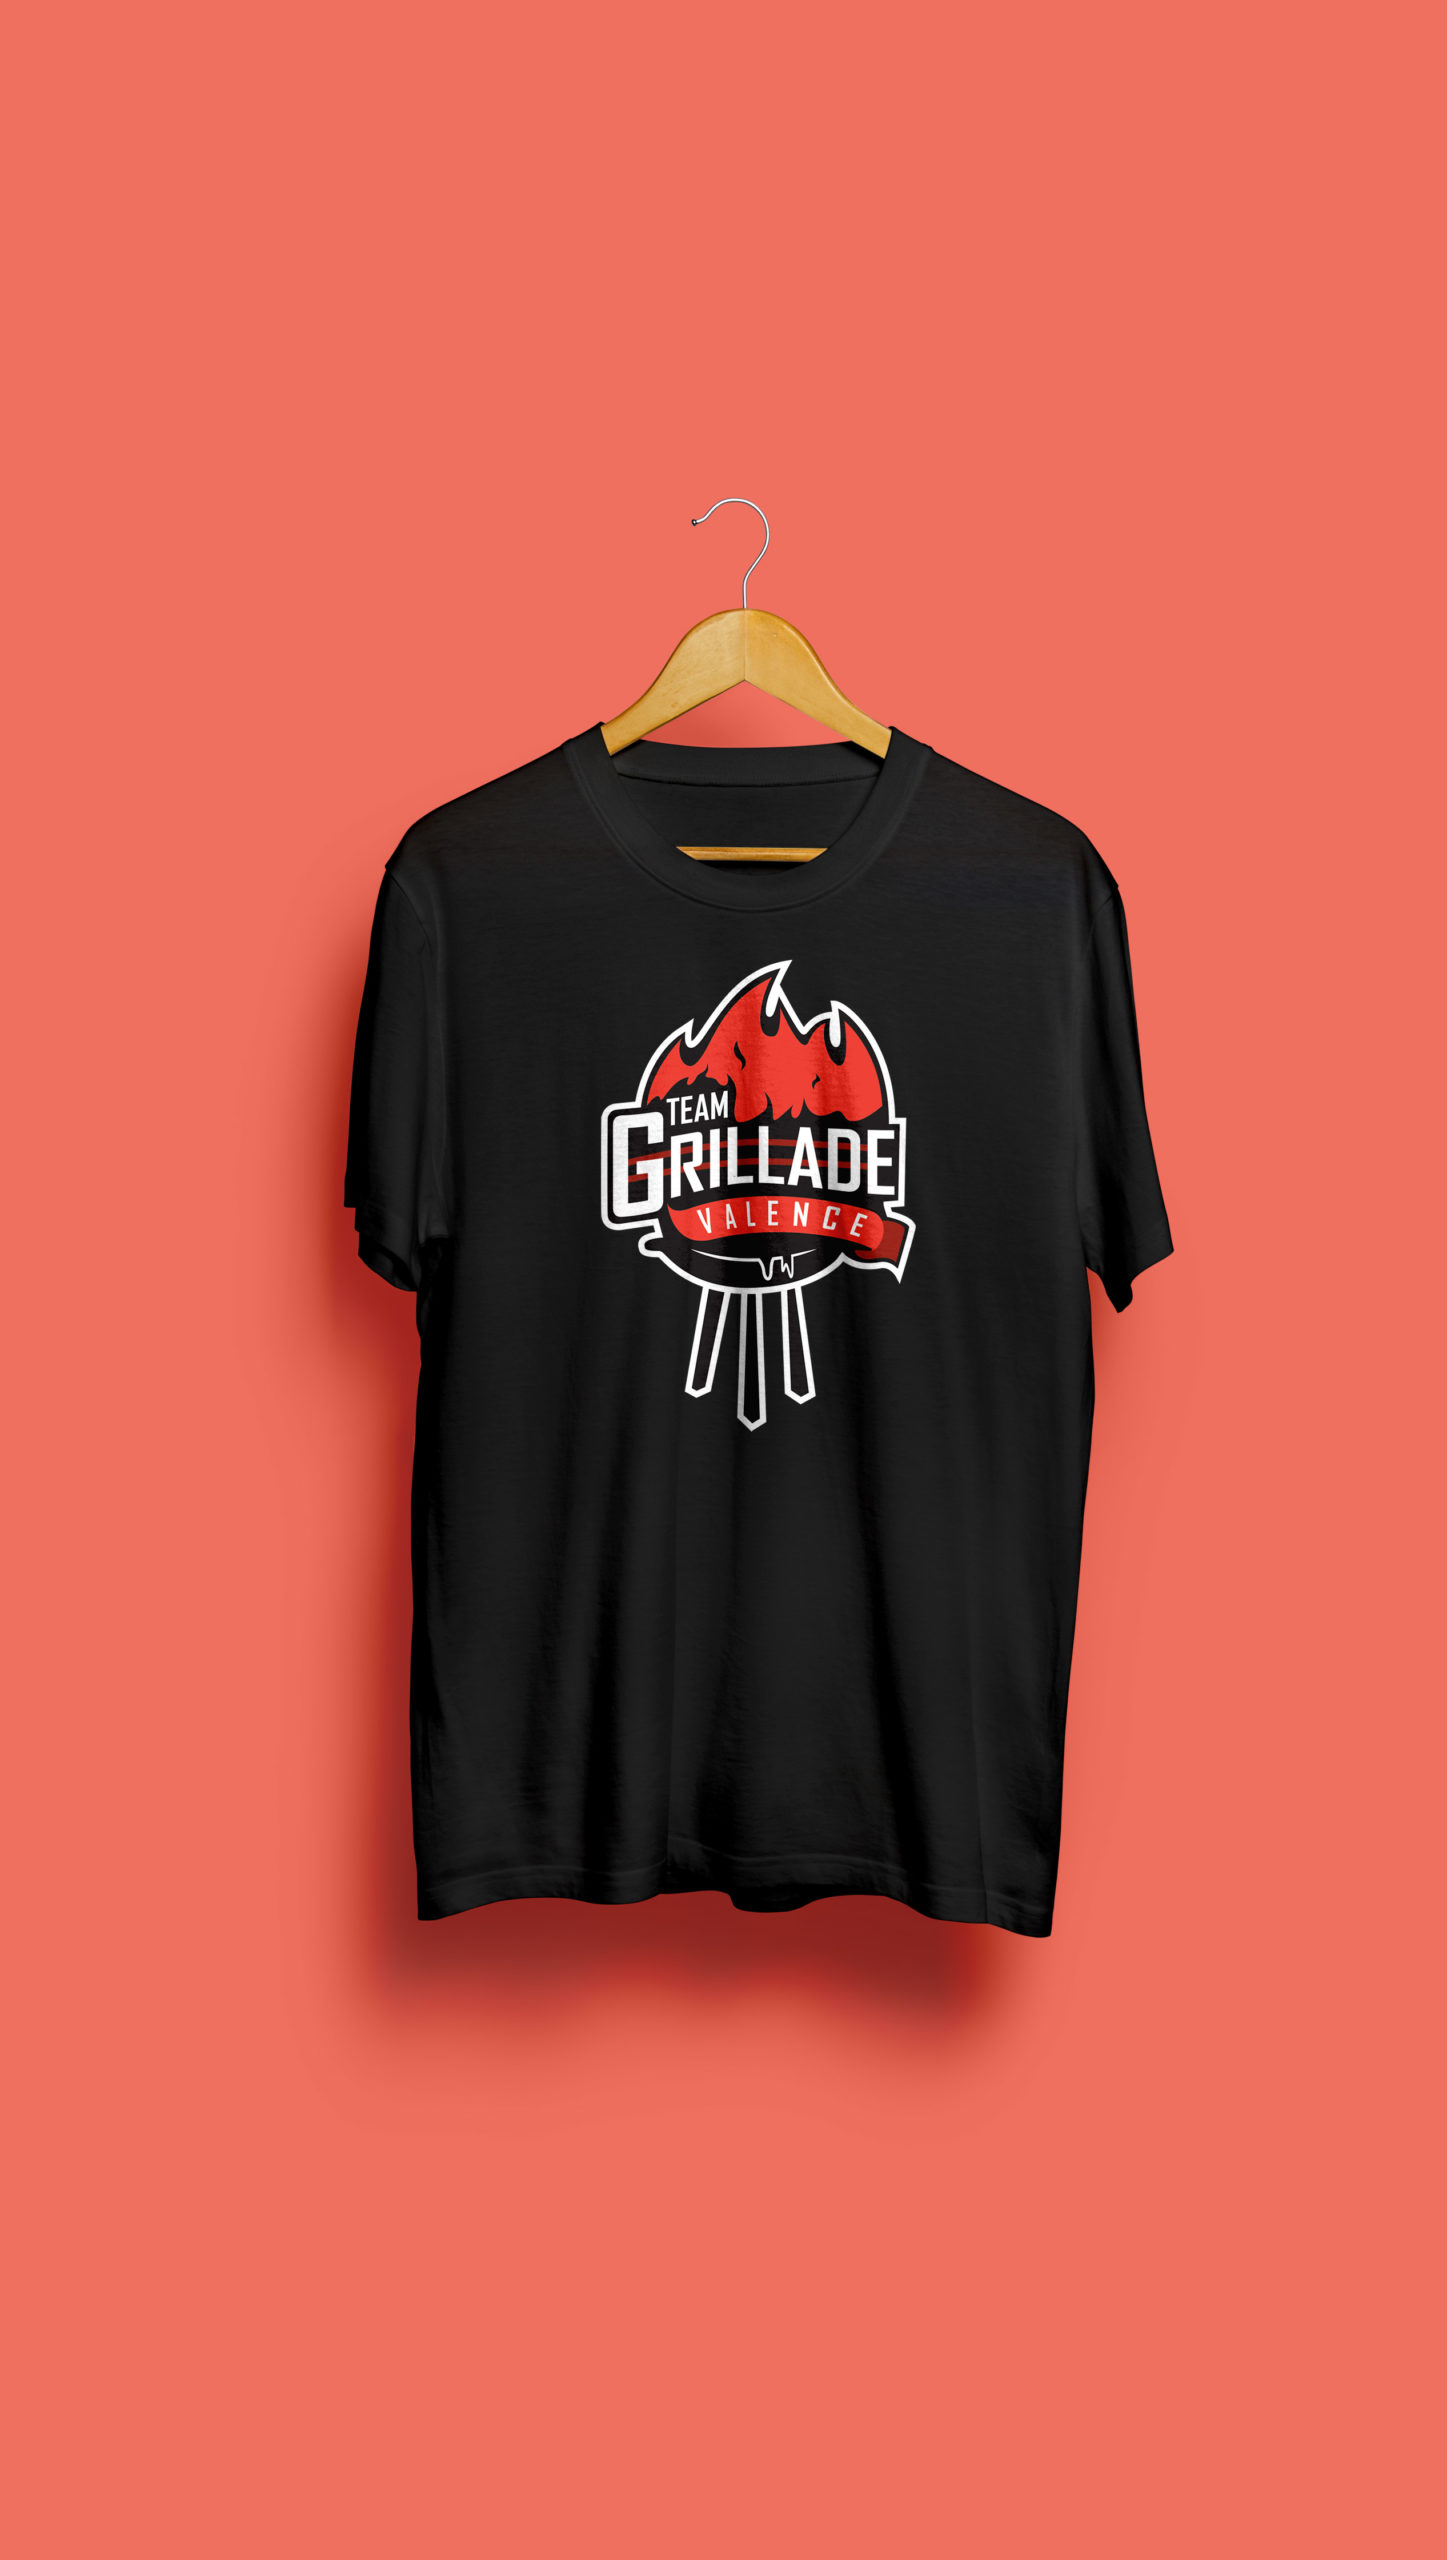 T shirt Team Grillade Valence